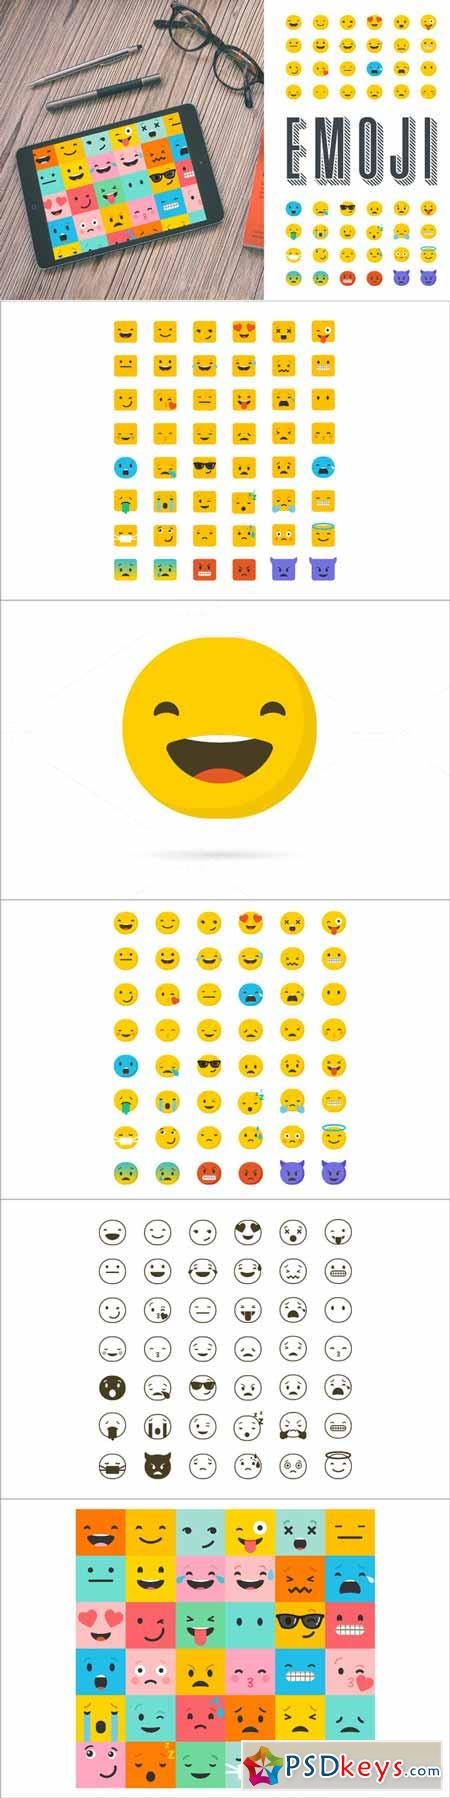 Emoji emoticons bundle of icons 584479